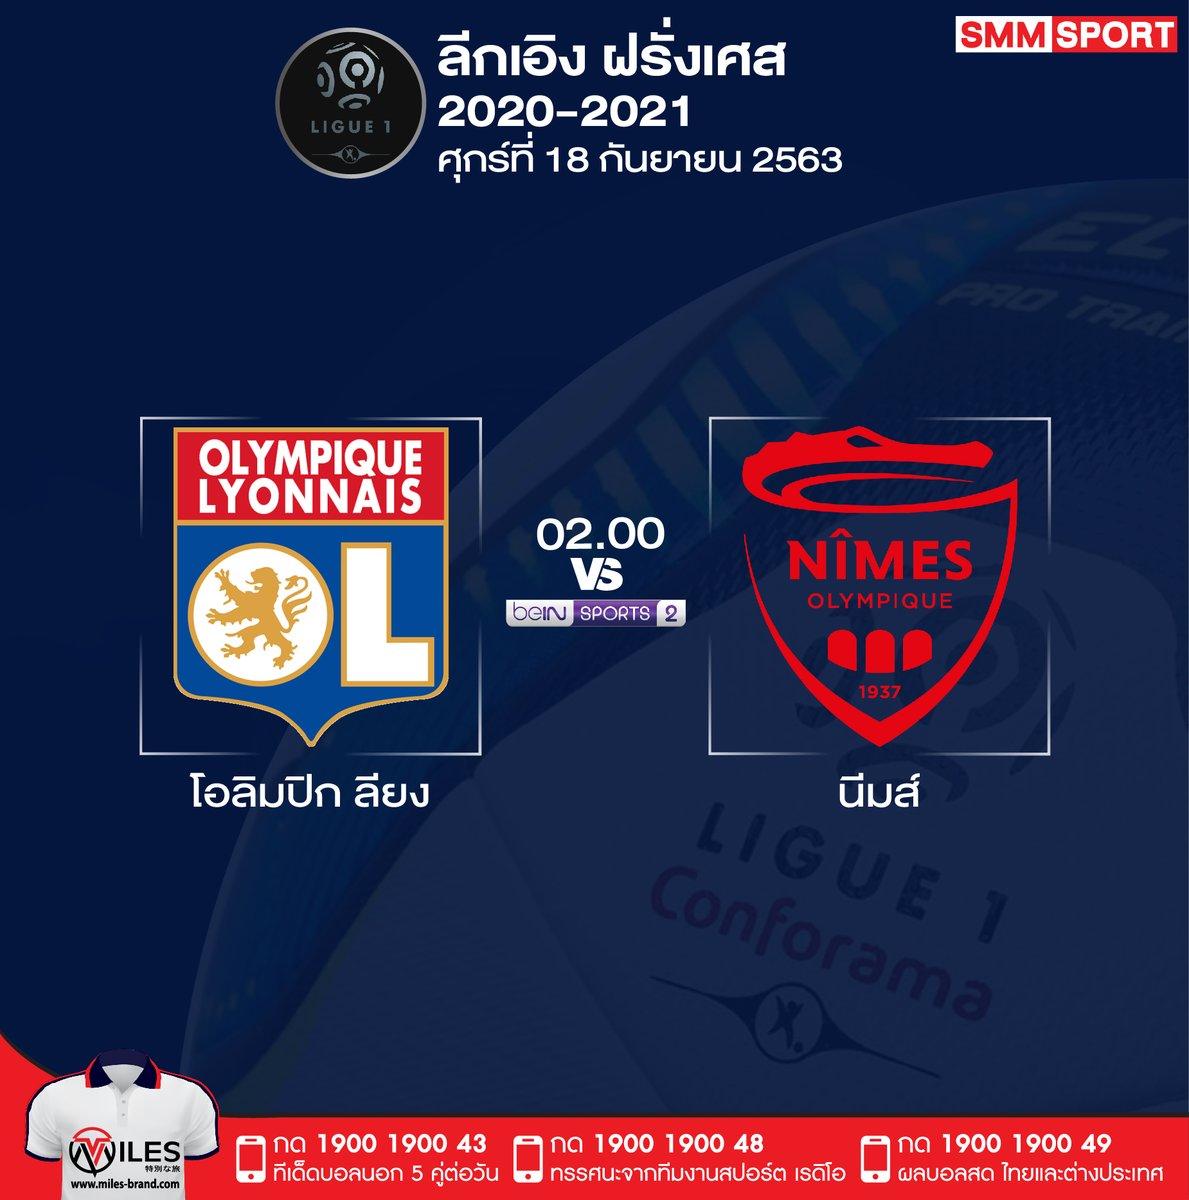 ⚽ #Ligue1 🇫🇷   เจ้าบ้าน โอลิมปิก ลียง แพ้เป็นครั้งแรกเกมล่าสุดเปิดบ้านรับการมาเยือนของ นีมส์ คืนนี้จะกู้หน้ากลับคว้าชัยได้อีกครั้งหรือไม่   📱 ผลบอลสด คลิก>>> https://t.co/JFgo5zW6ha  #SMMSPORT #ลีกเอิง #ลียง #นีมส์ https://t.co/azPWrJQMab